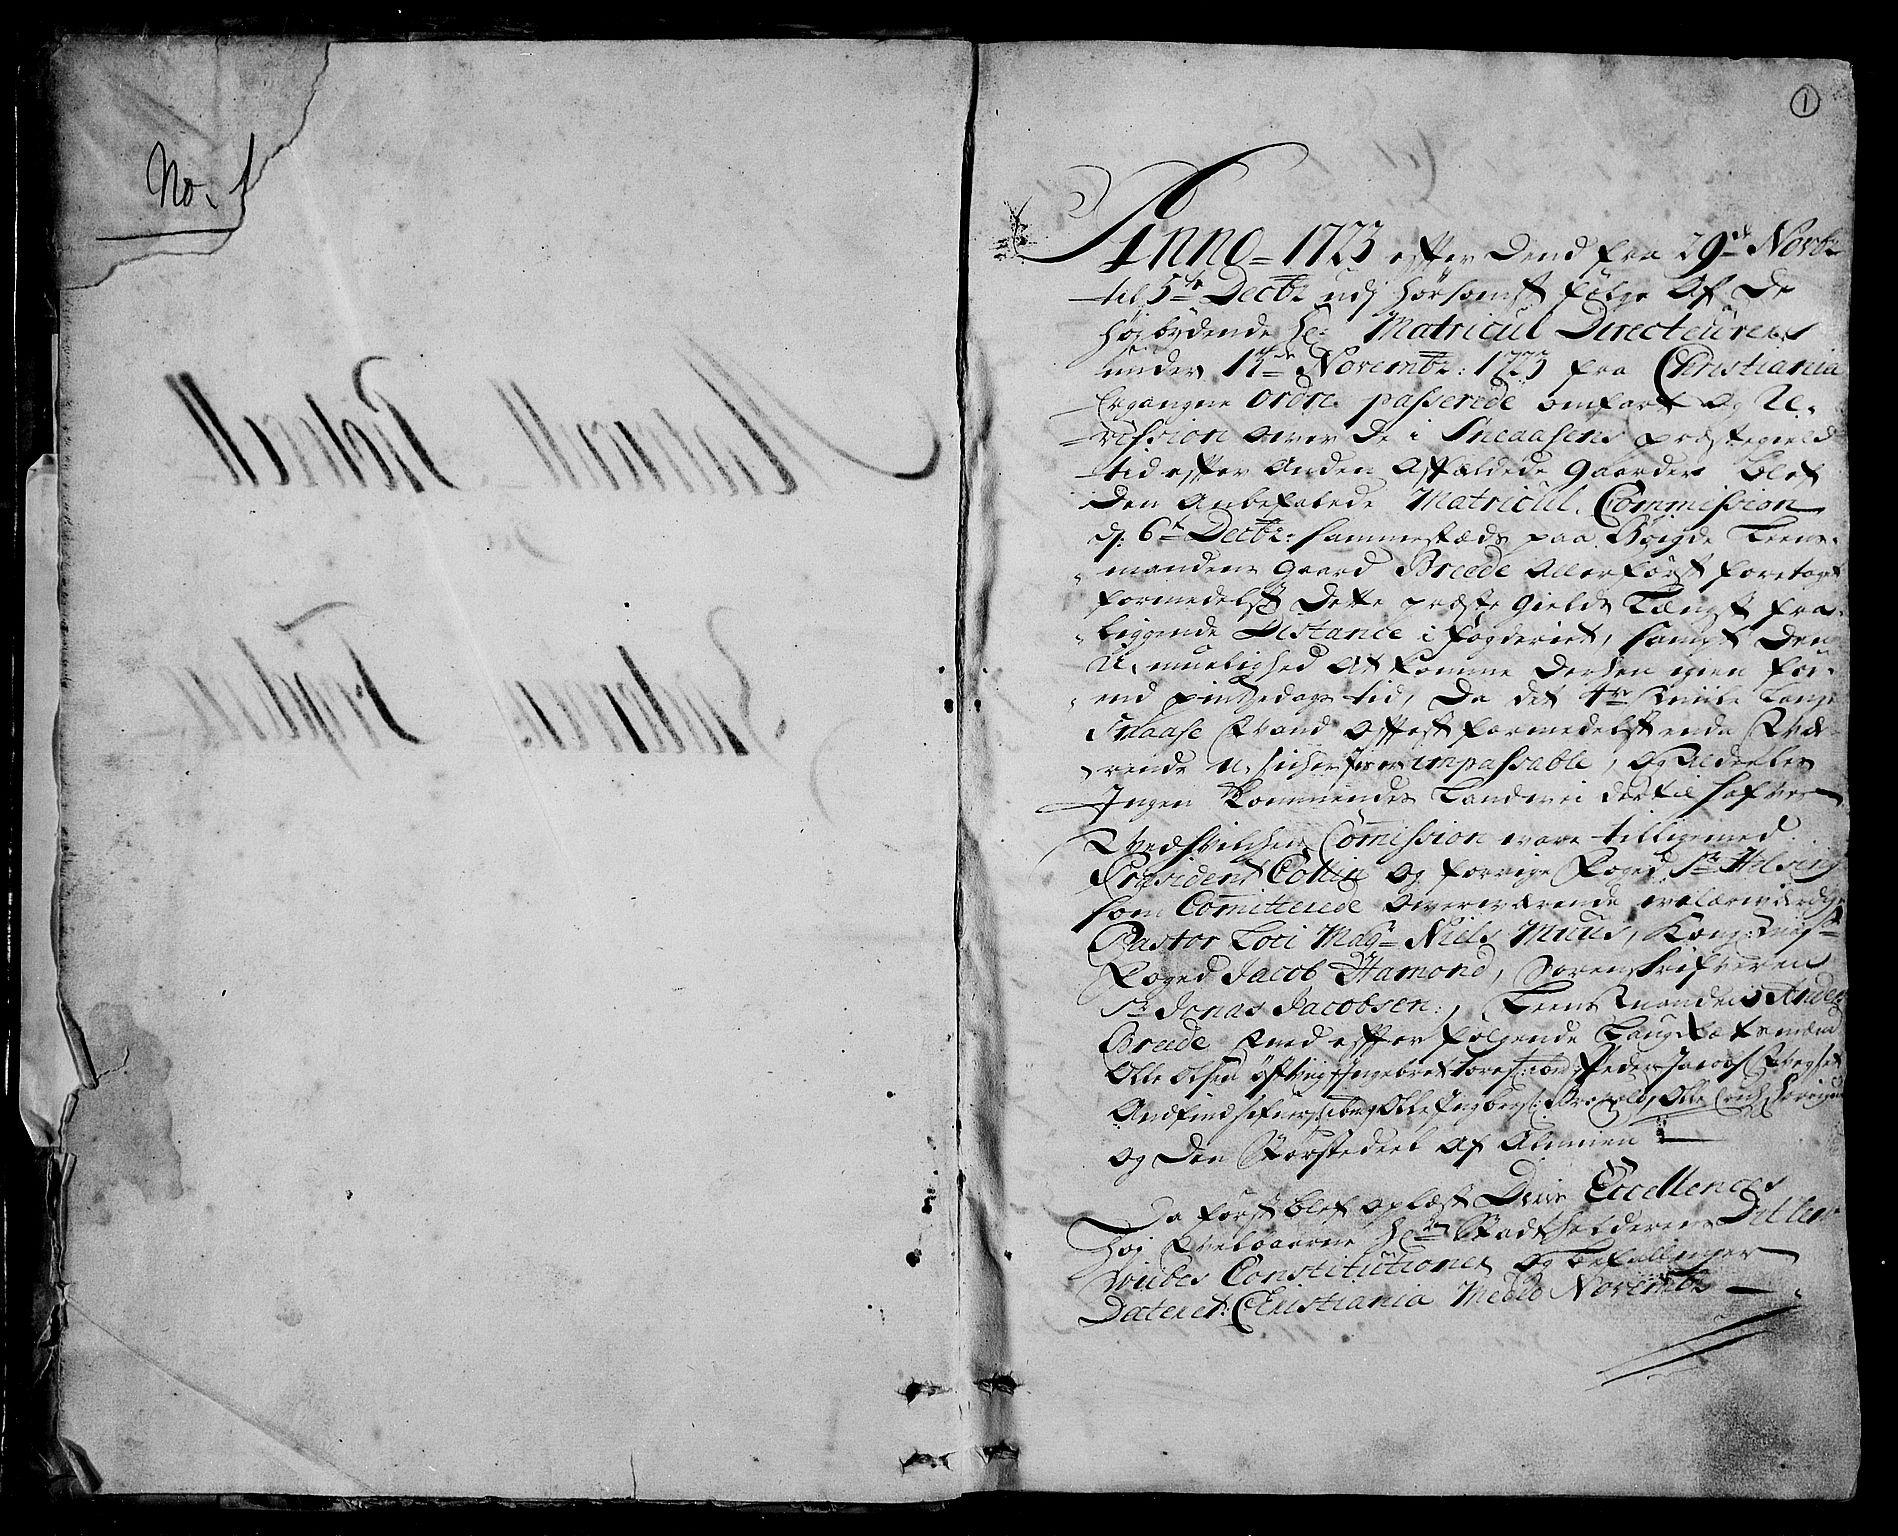 RA, Rentekammeret inntil 1814, Realistisk ordnet avdeling, N/Nb/Nbf/L0166: Inderøy eksaminasjonsprotokoll, 1723, s. 1a